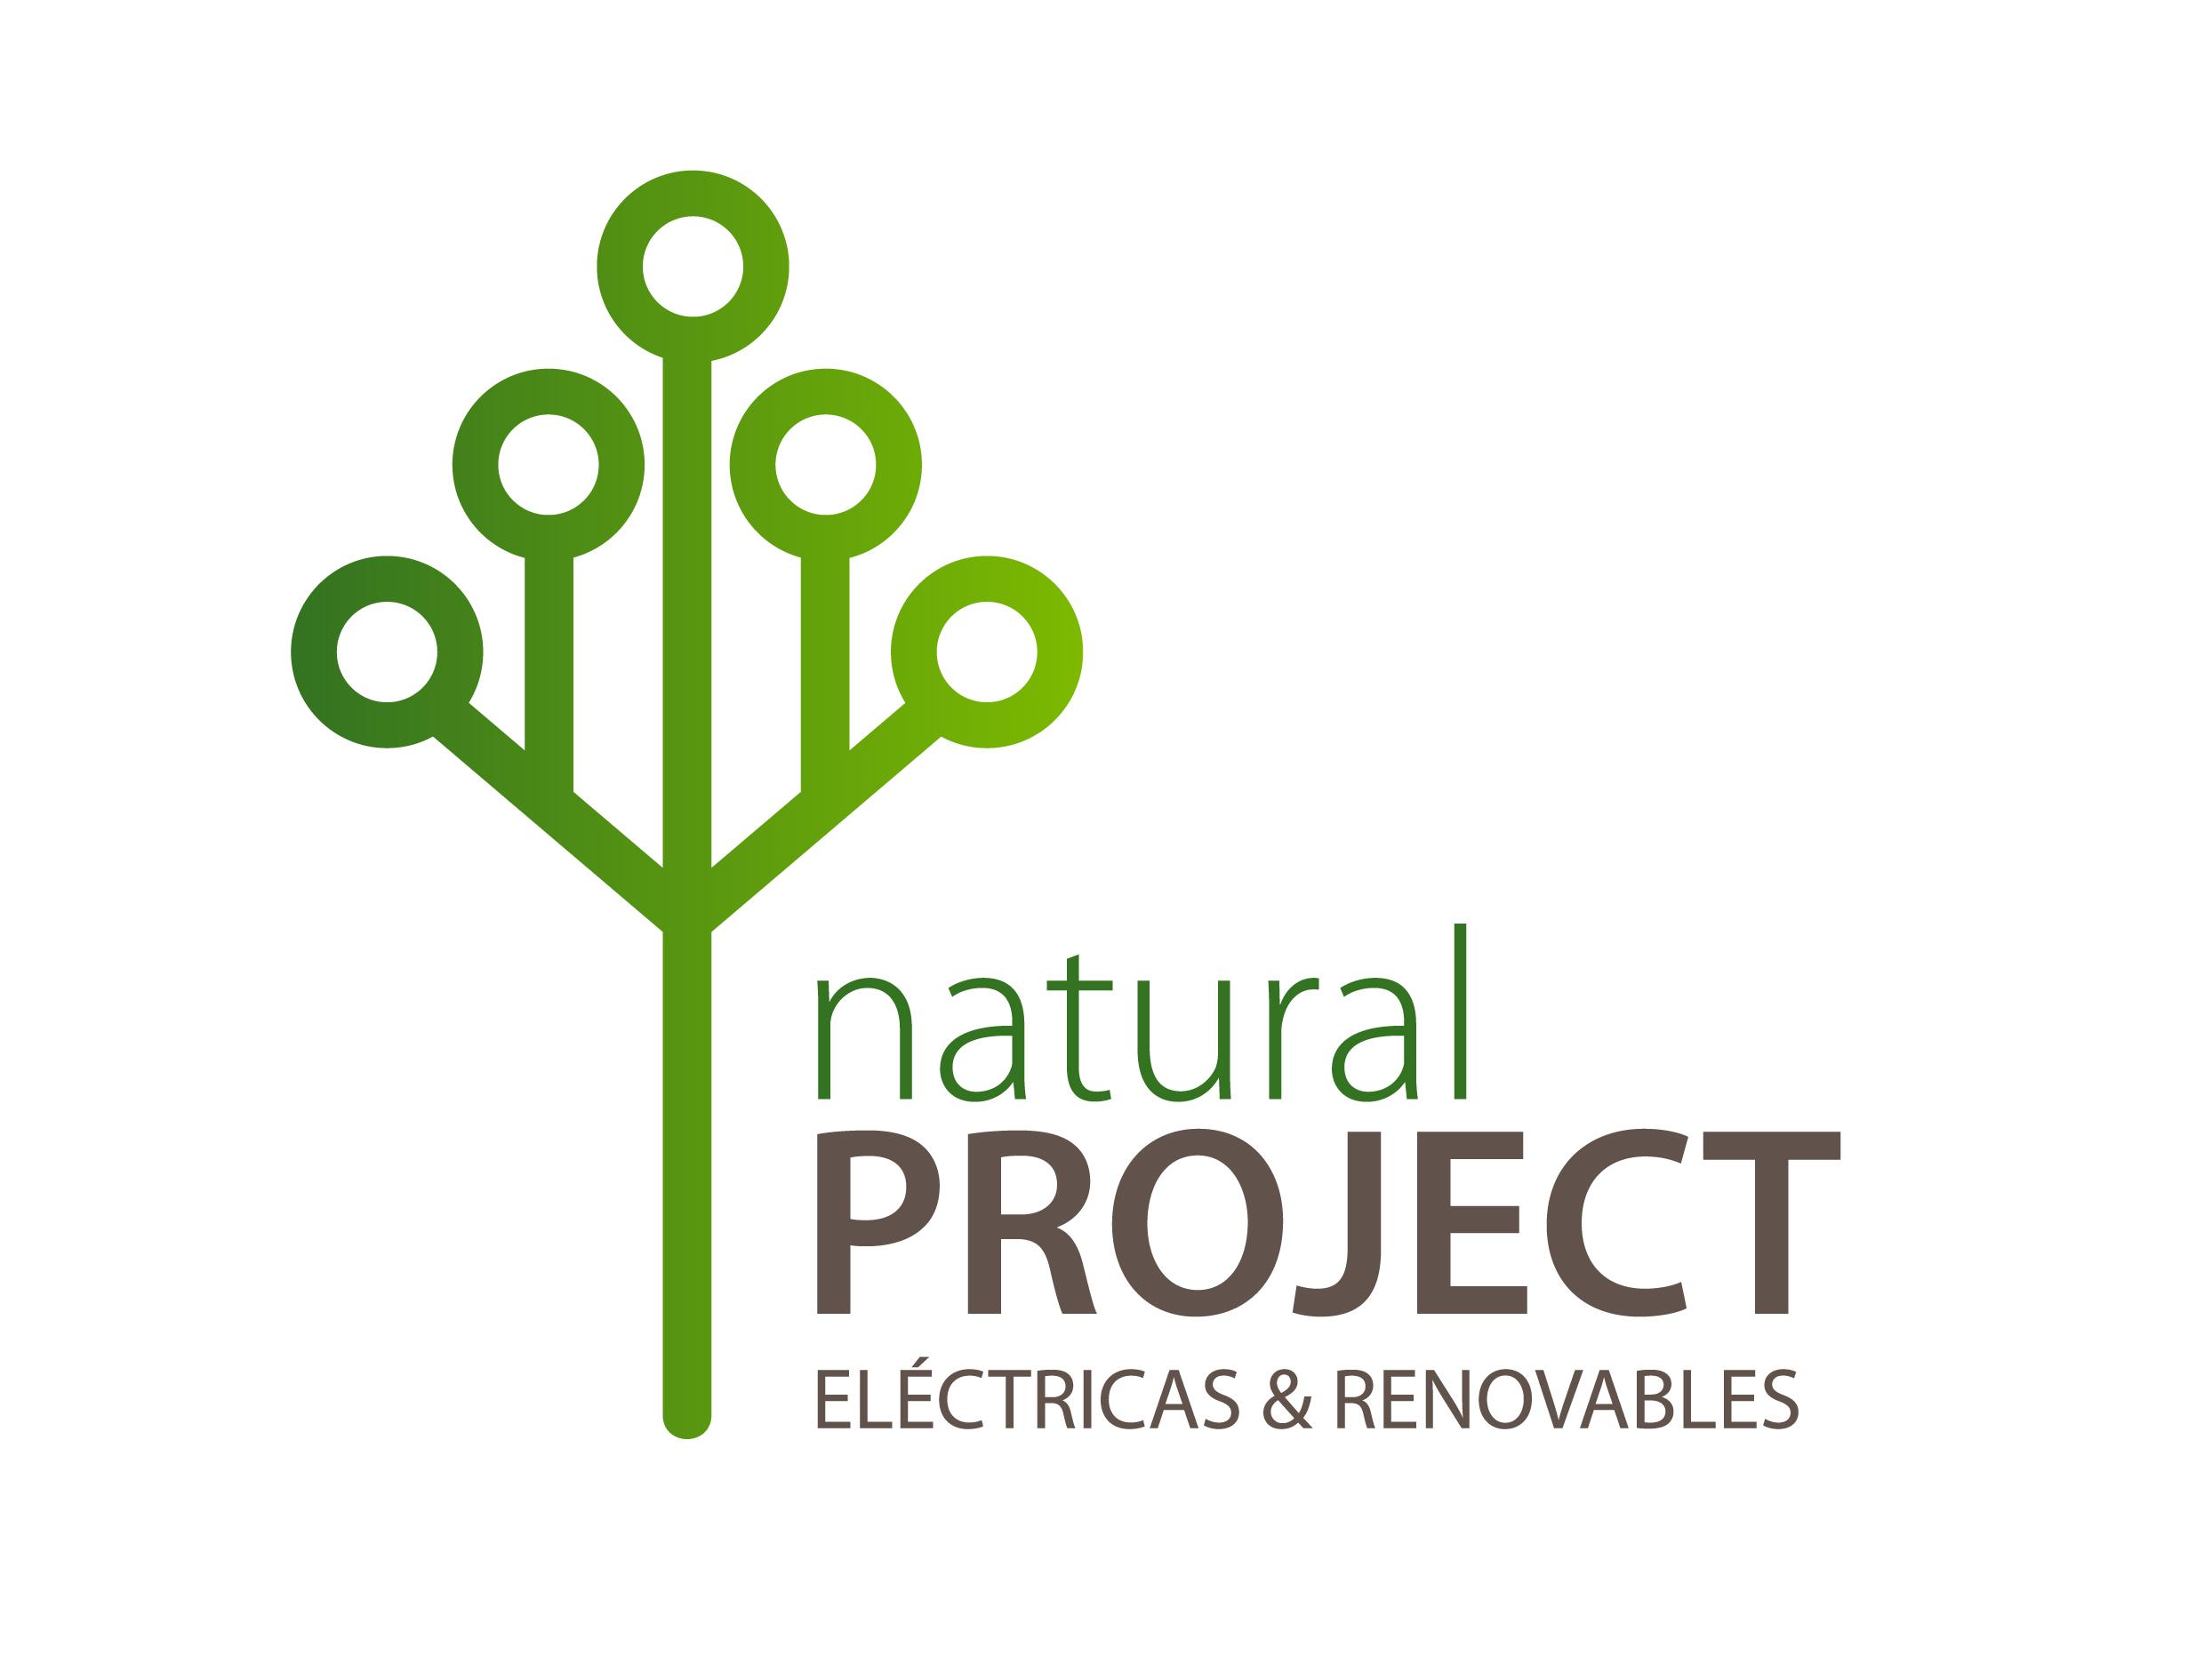 Carlos Robles (natural Project)